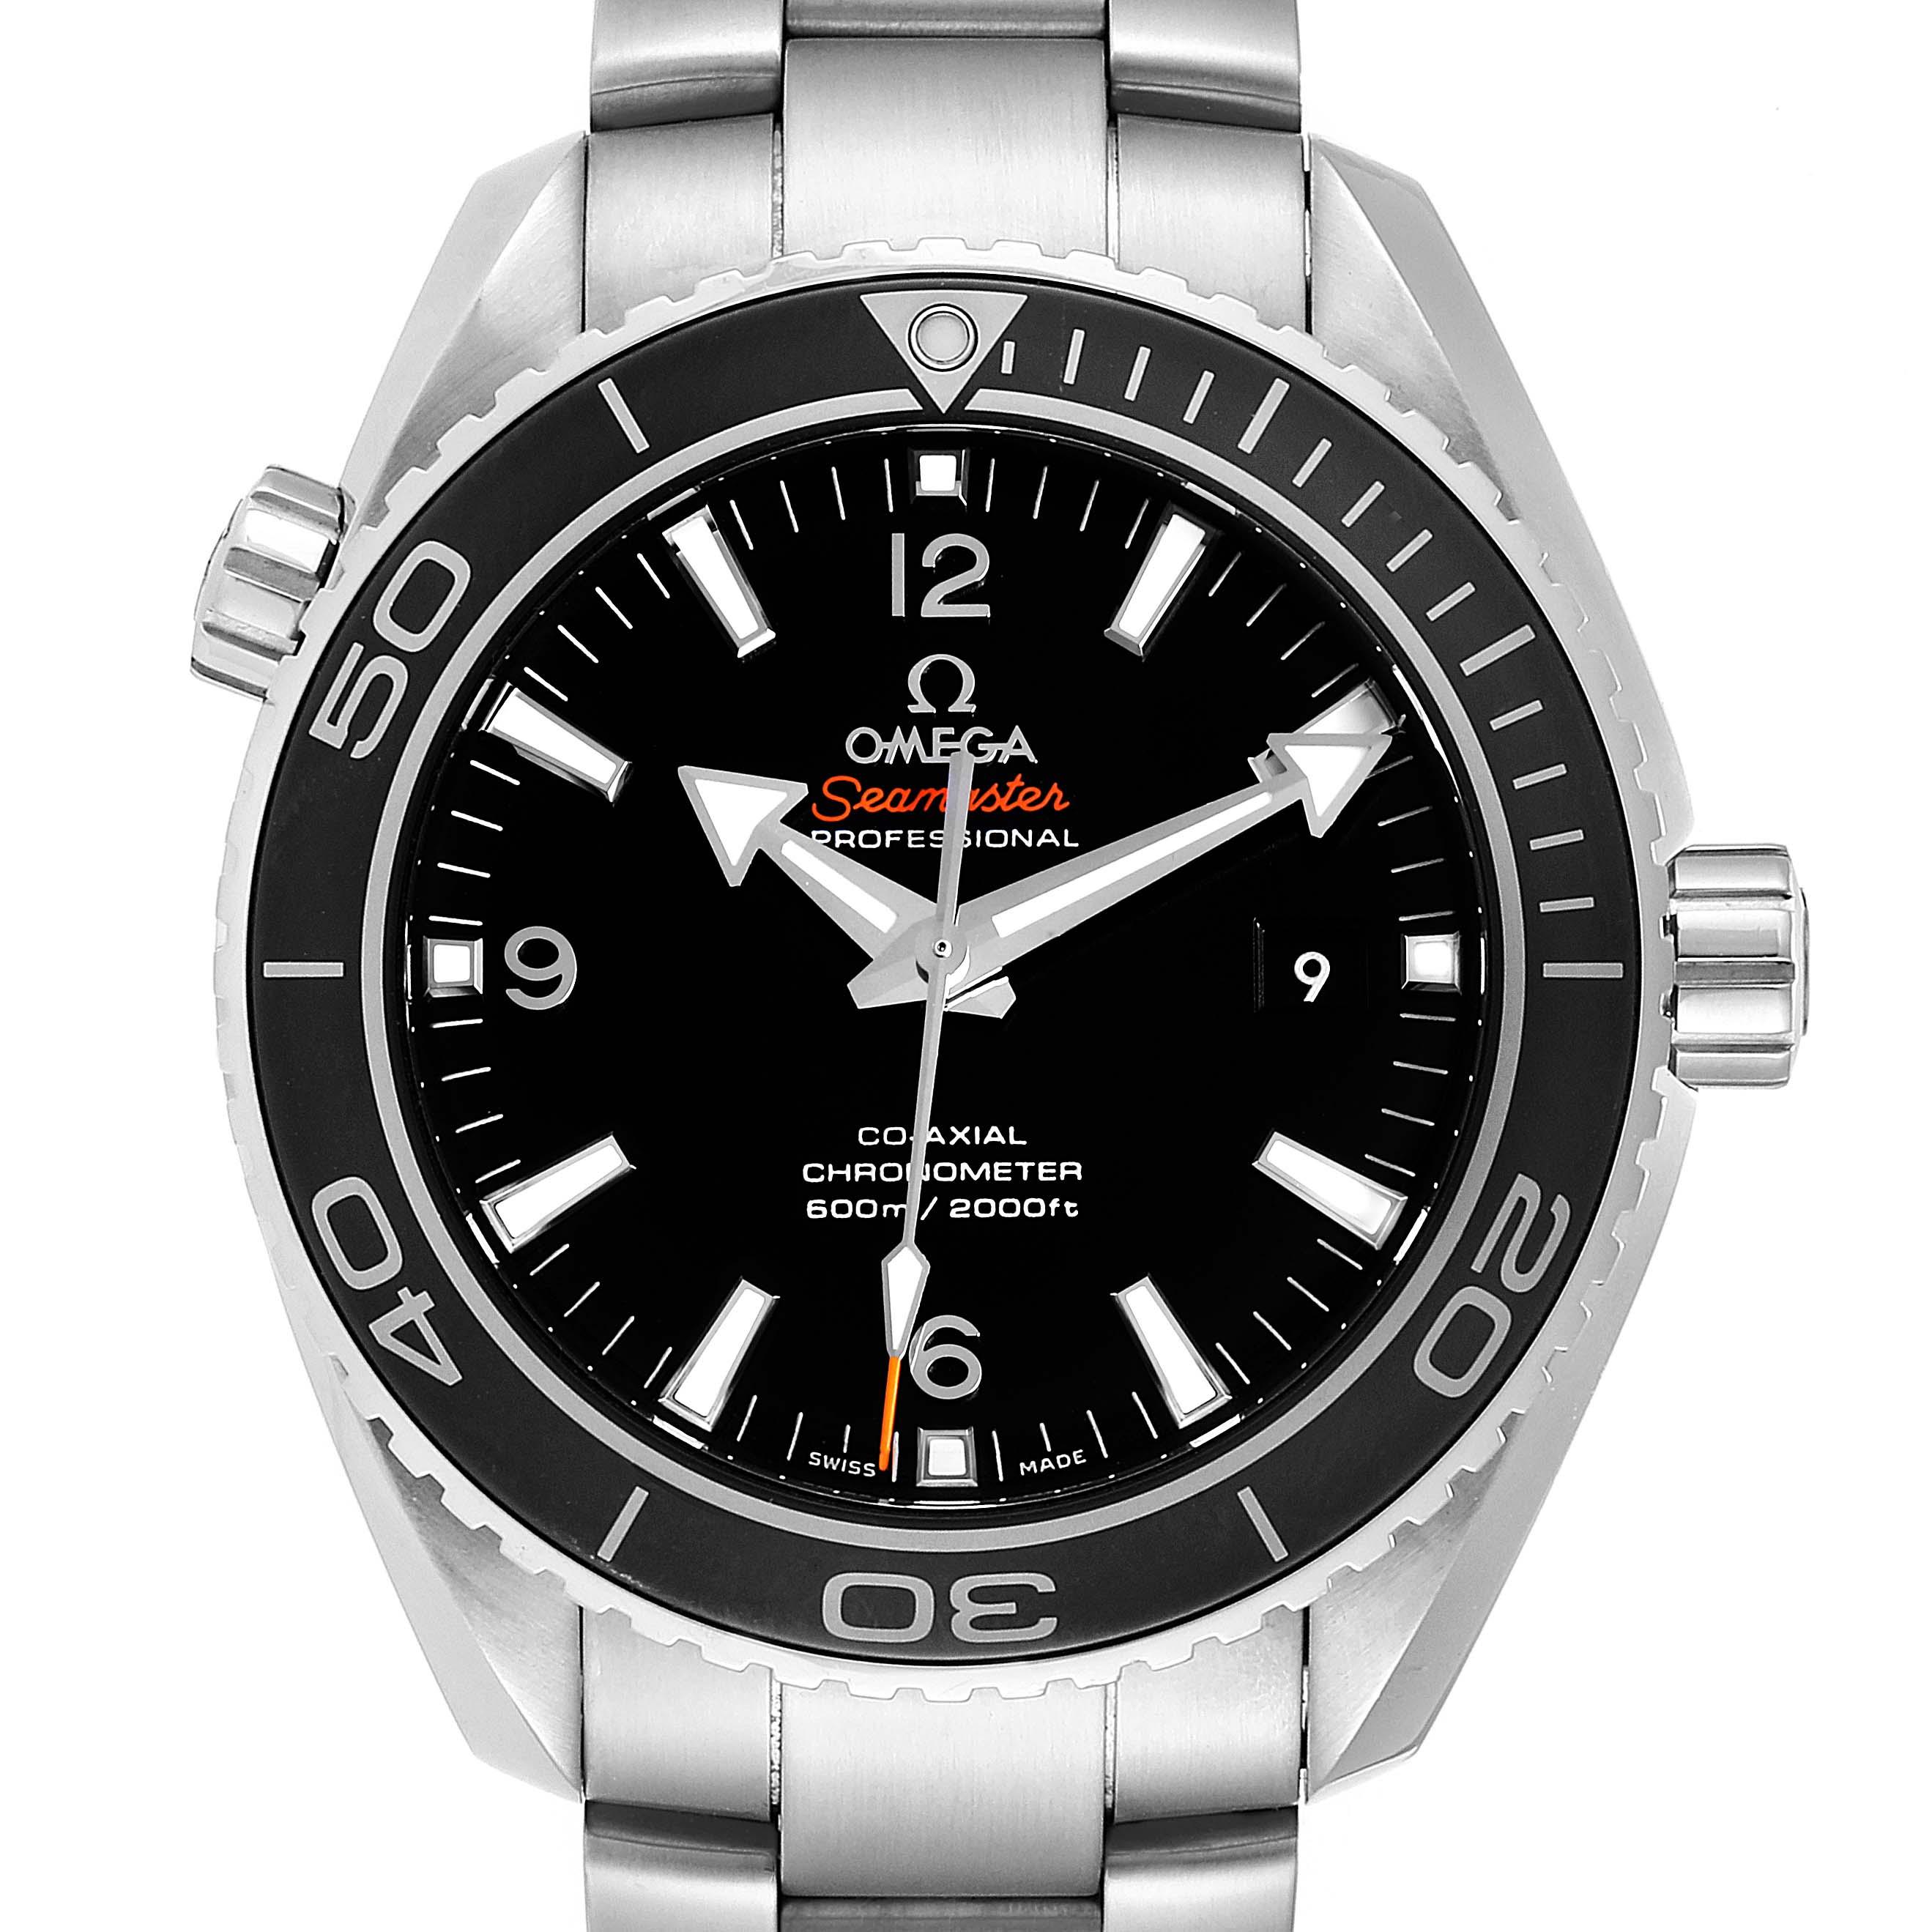 Omega Seamaster Planet Ocean 600M Steel Mens Watch 232.30.46.21.01.001